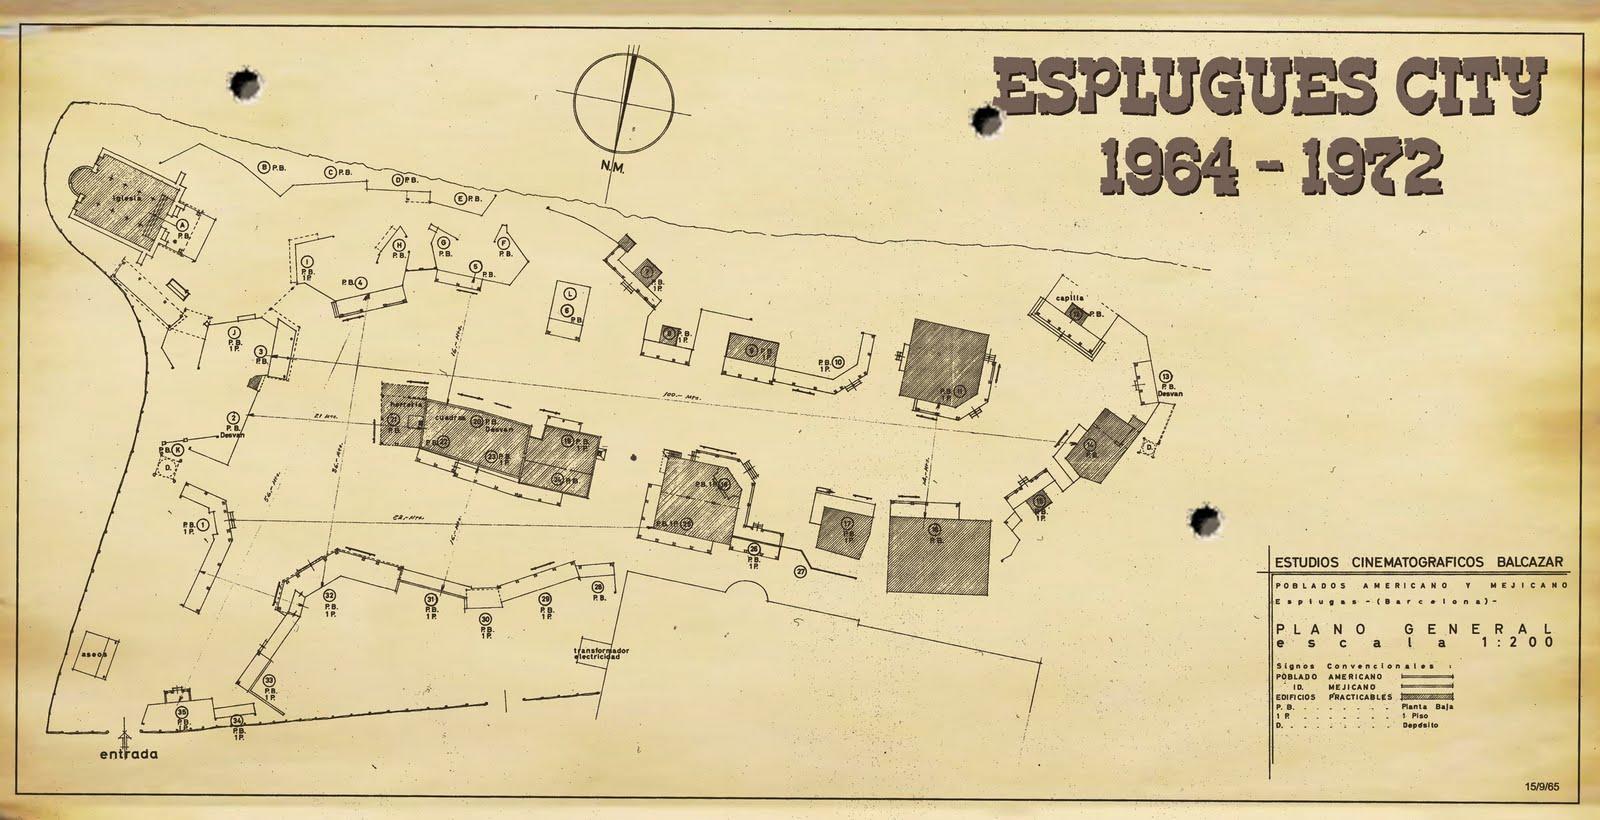 ESPLUGAS CITY (Studios Balcazar), Barcelone.  Plano%2BEsplugues%2BCity